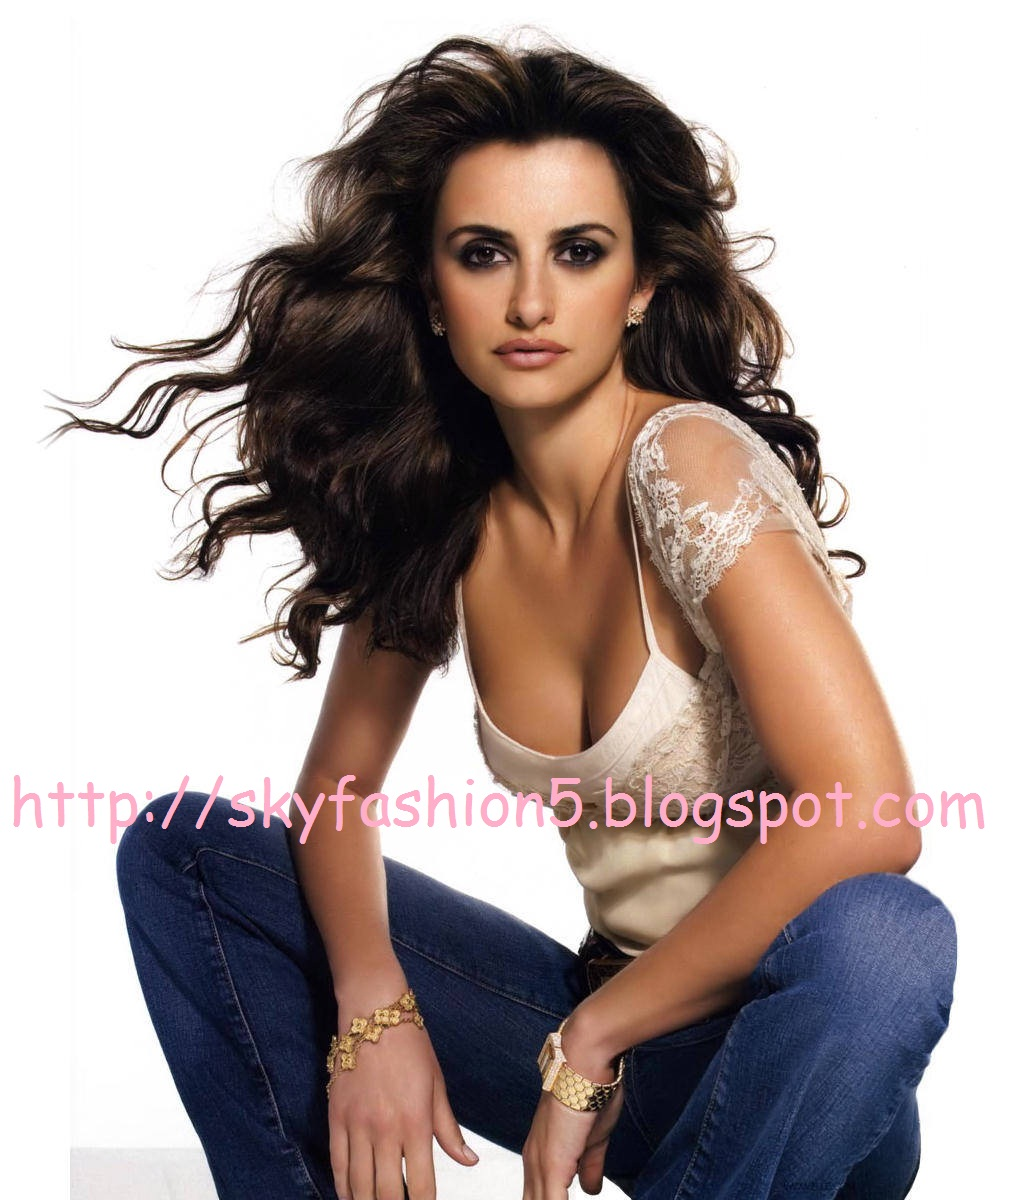 http://1.bp.blogspot.com/-PN9kaOyQlcA/Tt979jkdP8I/AAAAAAAAArU/Hu4pIngX9SM/s1600/PenelopeCruz003.jpg